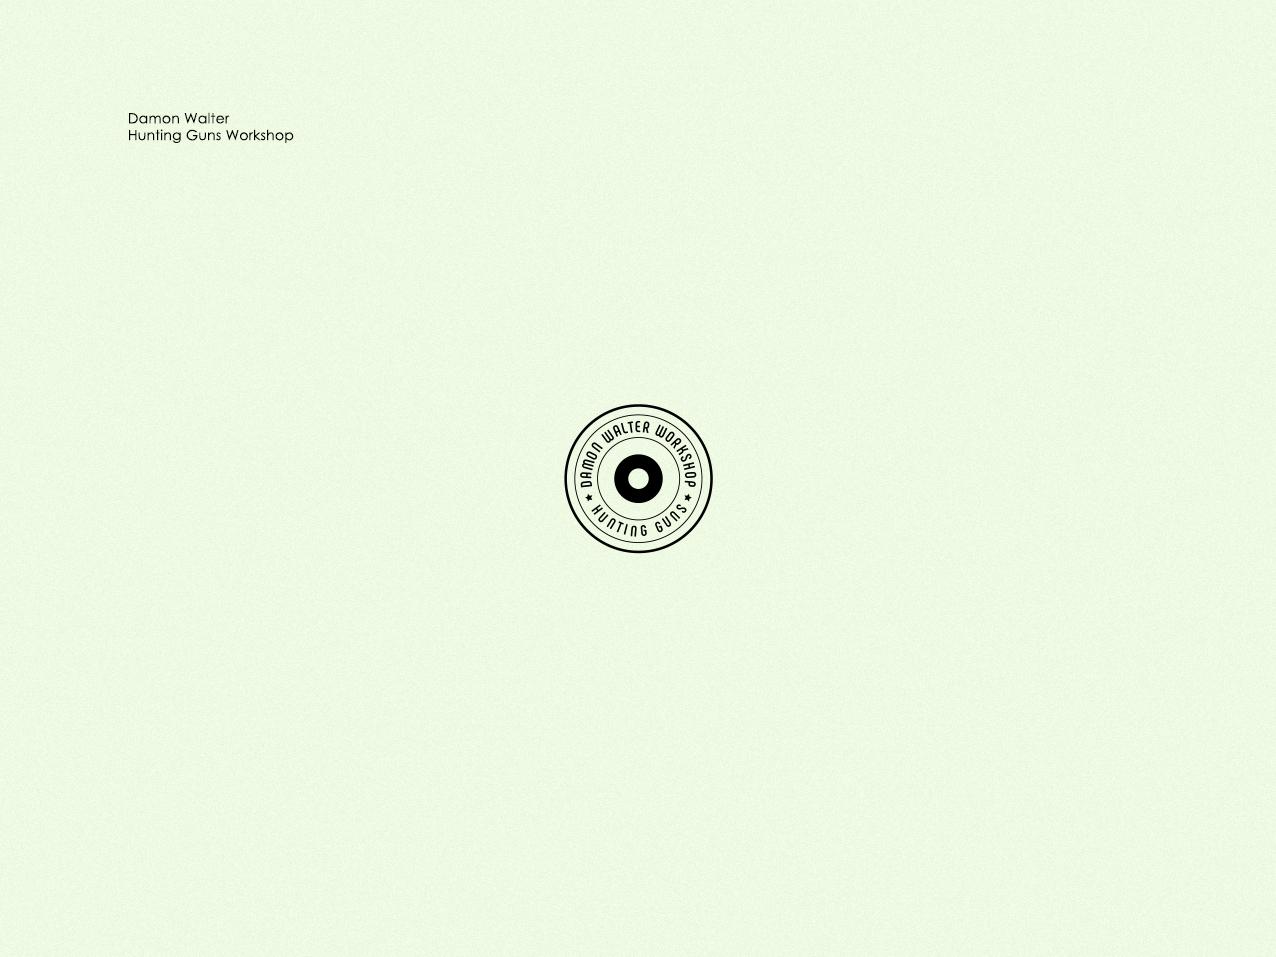 Damon Walter. Hunting Guns Workshop vintage style vintage logomark geometric simple minimal logo